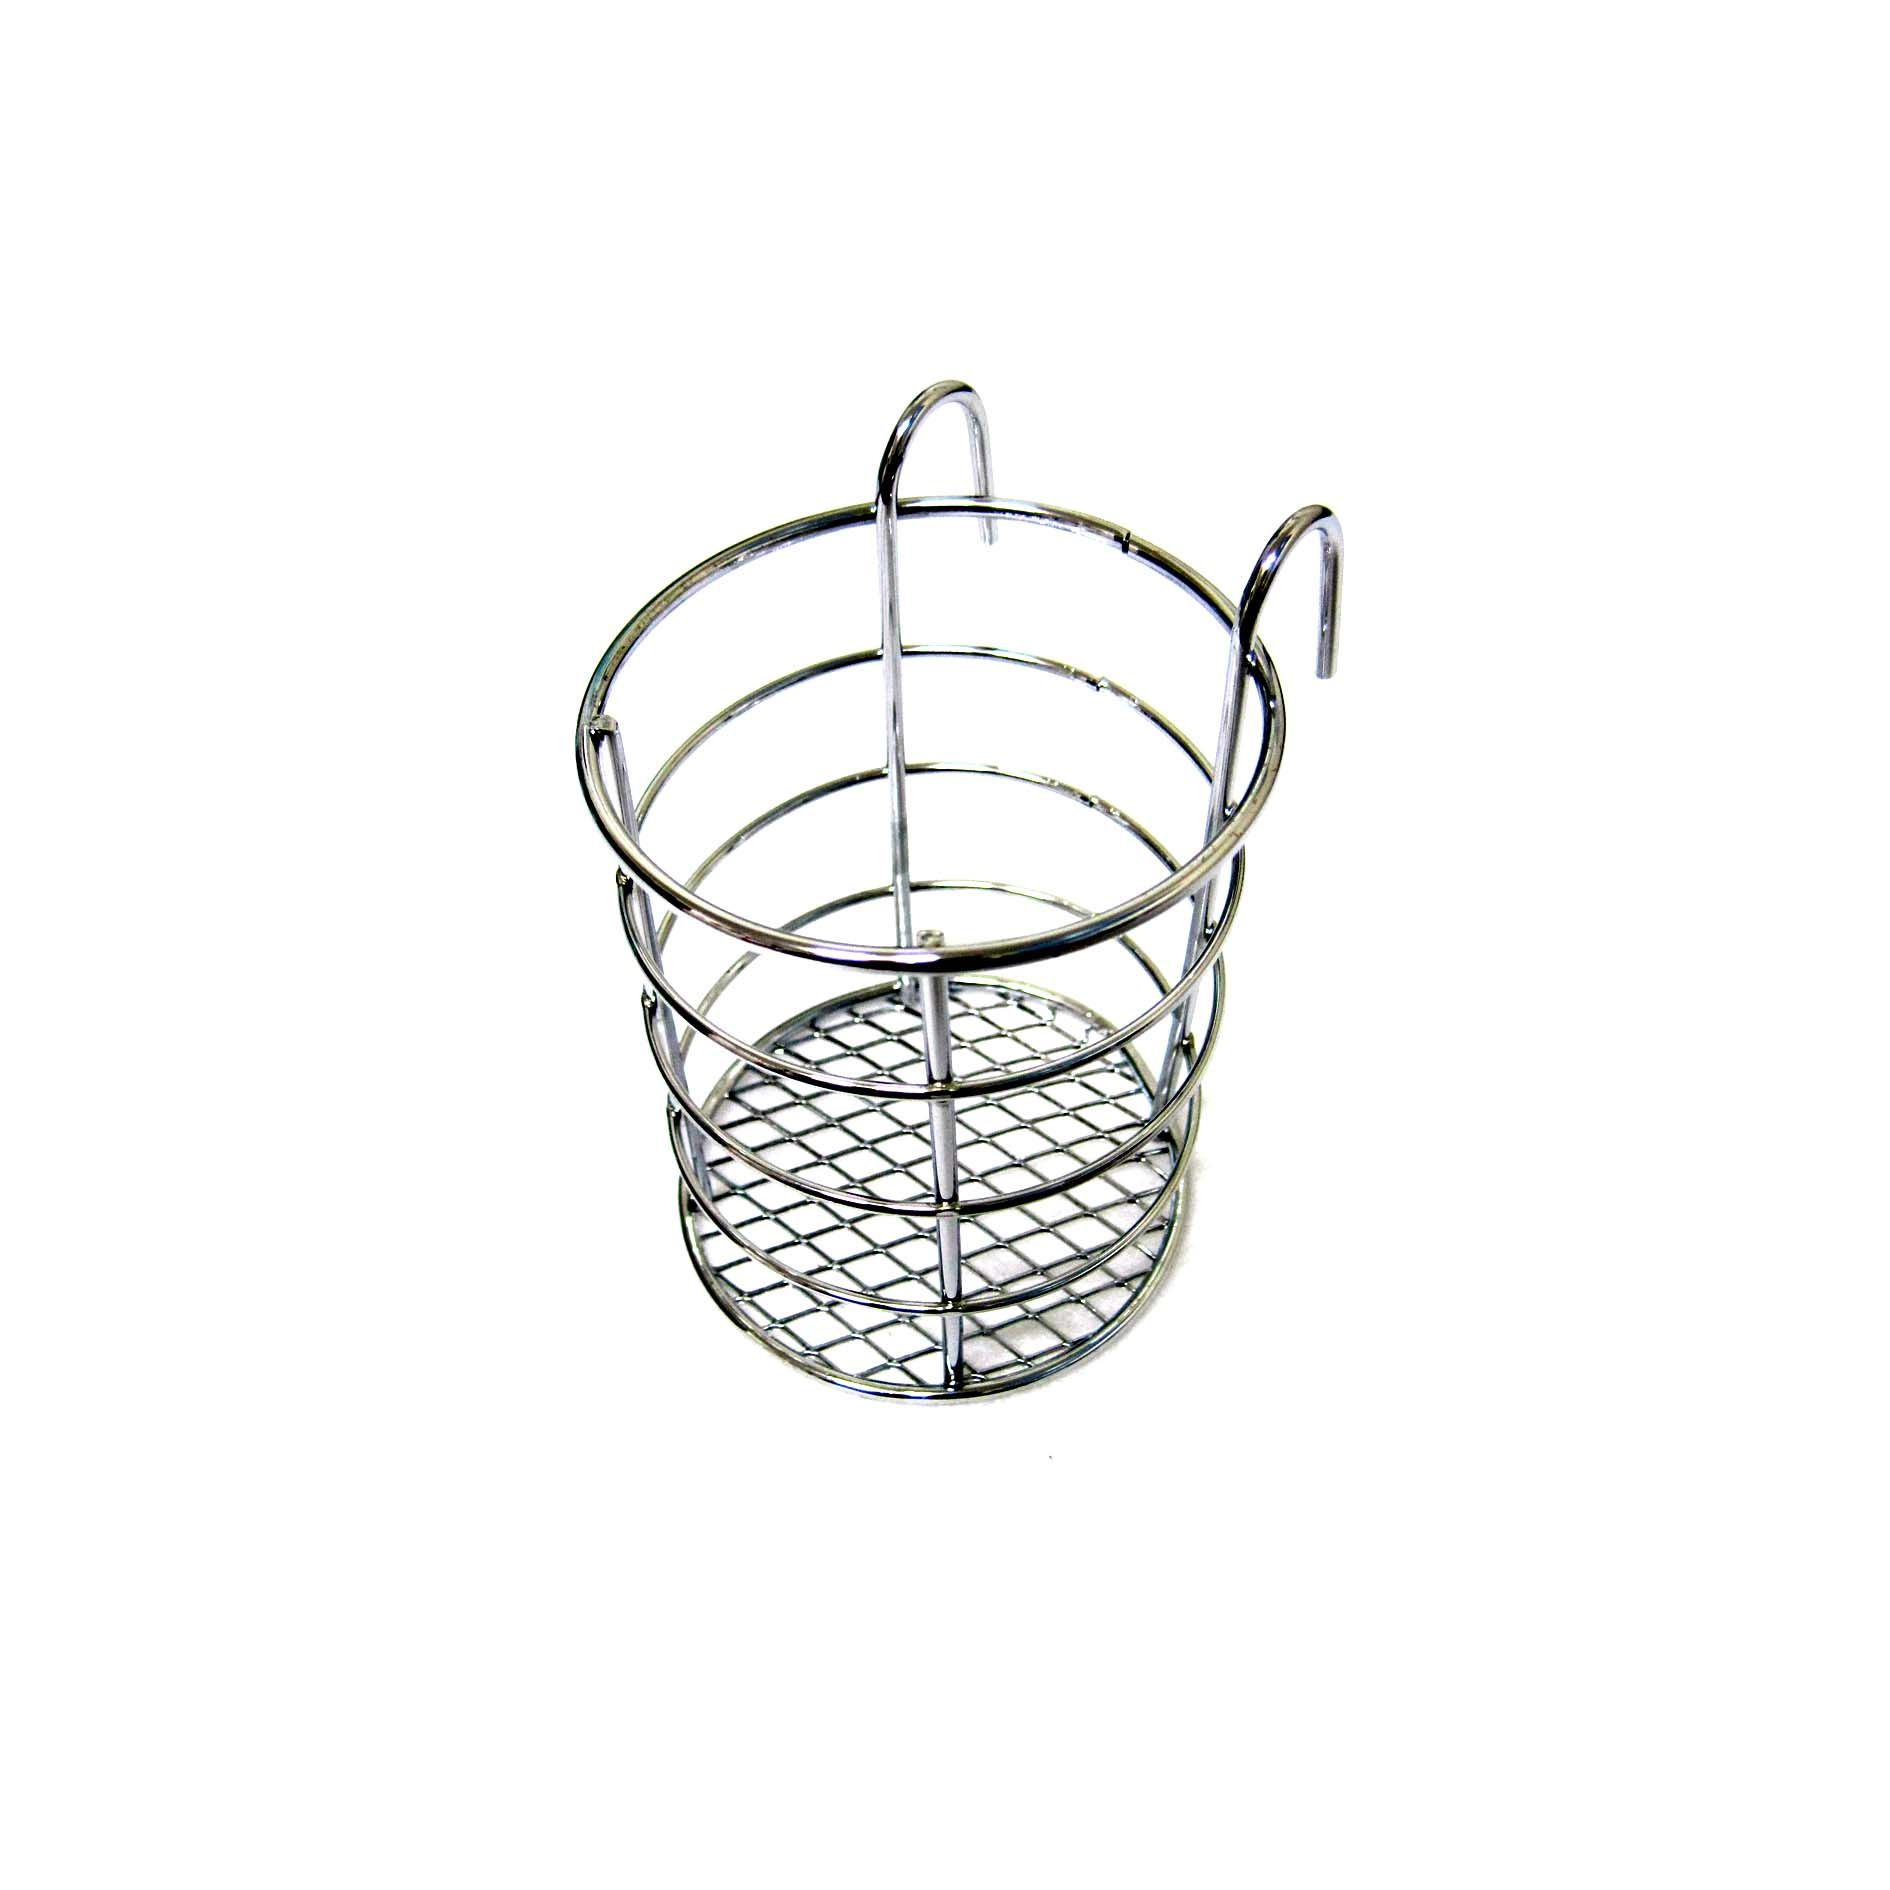 new steel wire sink basket cutlery holder cooking utensils